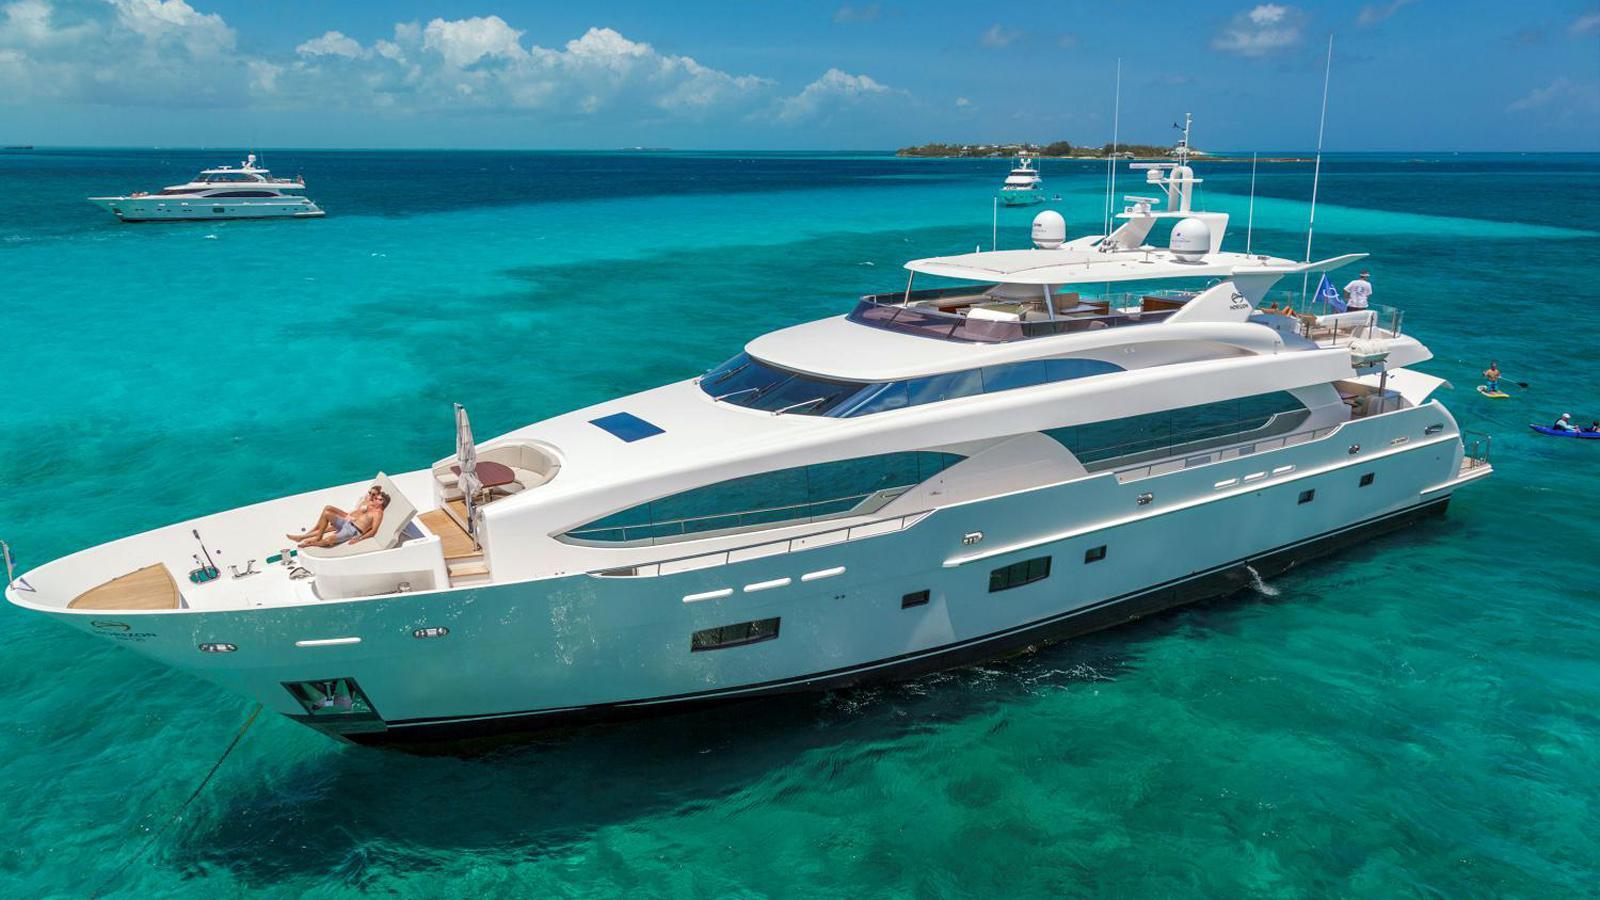 rp120 motoryacht horizon yachts 37m 2017 half profile